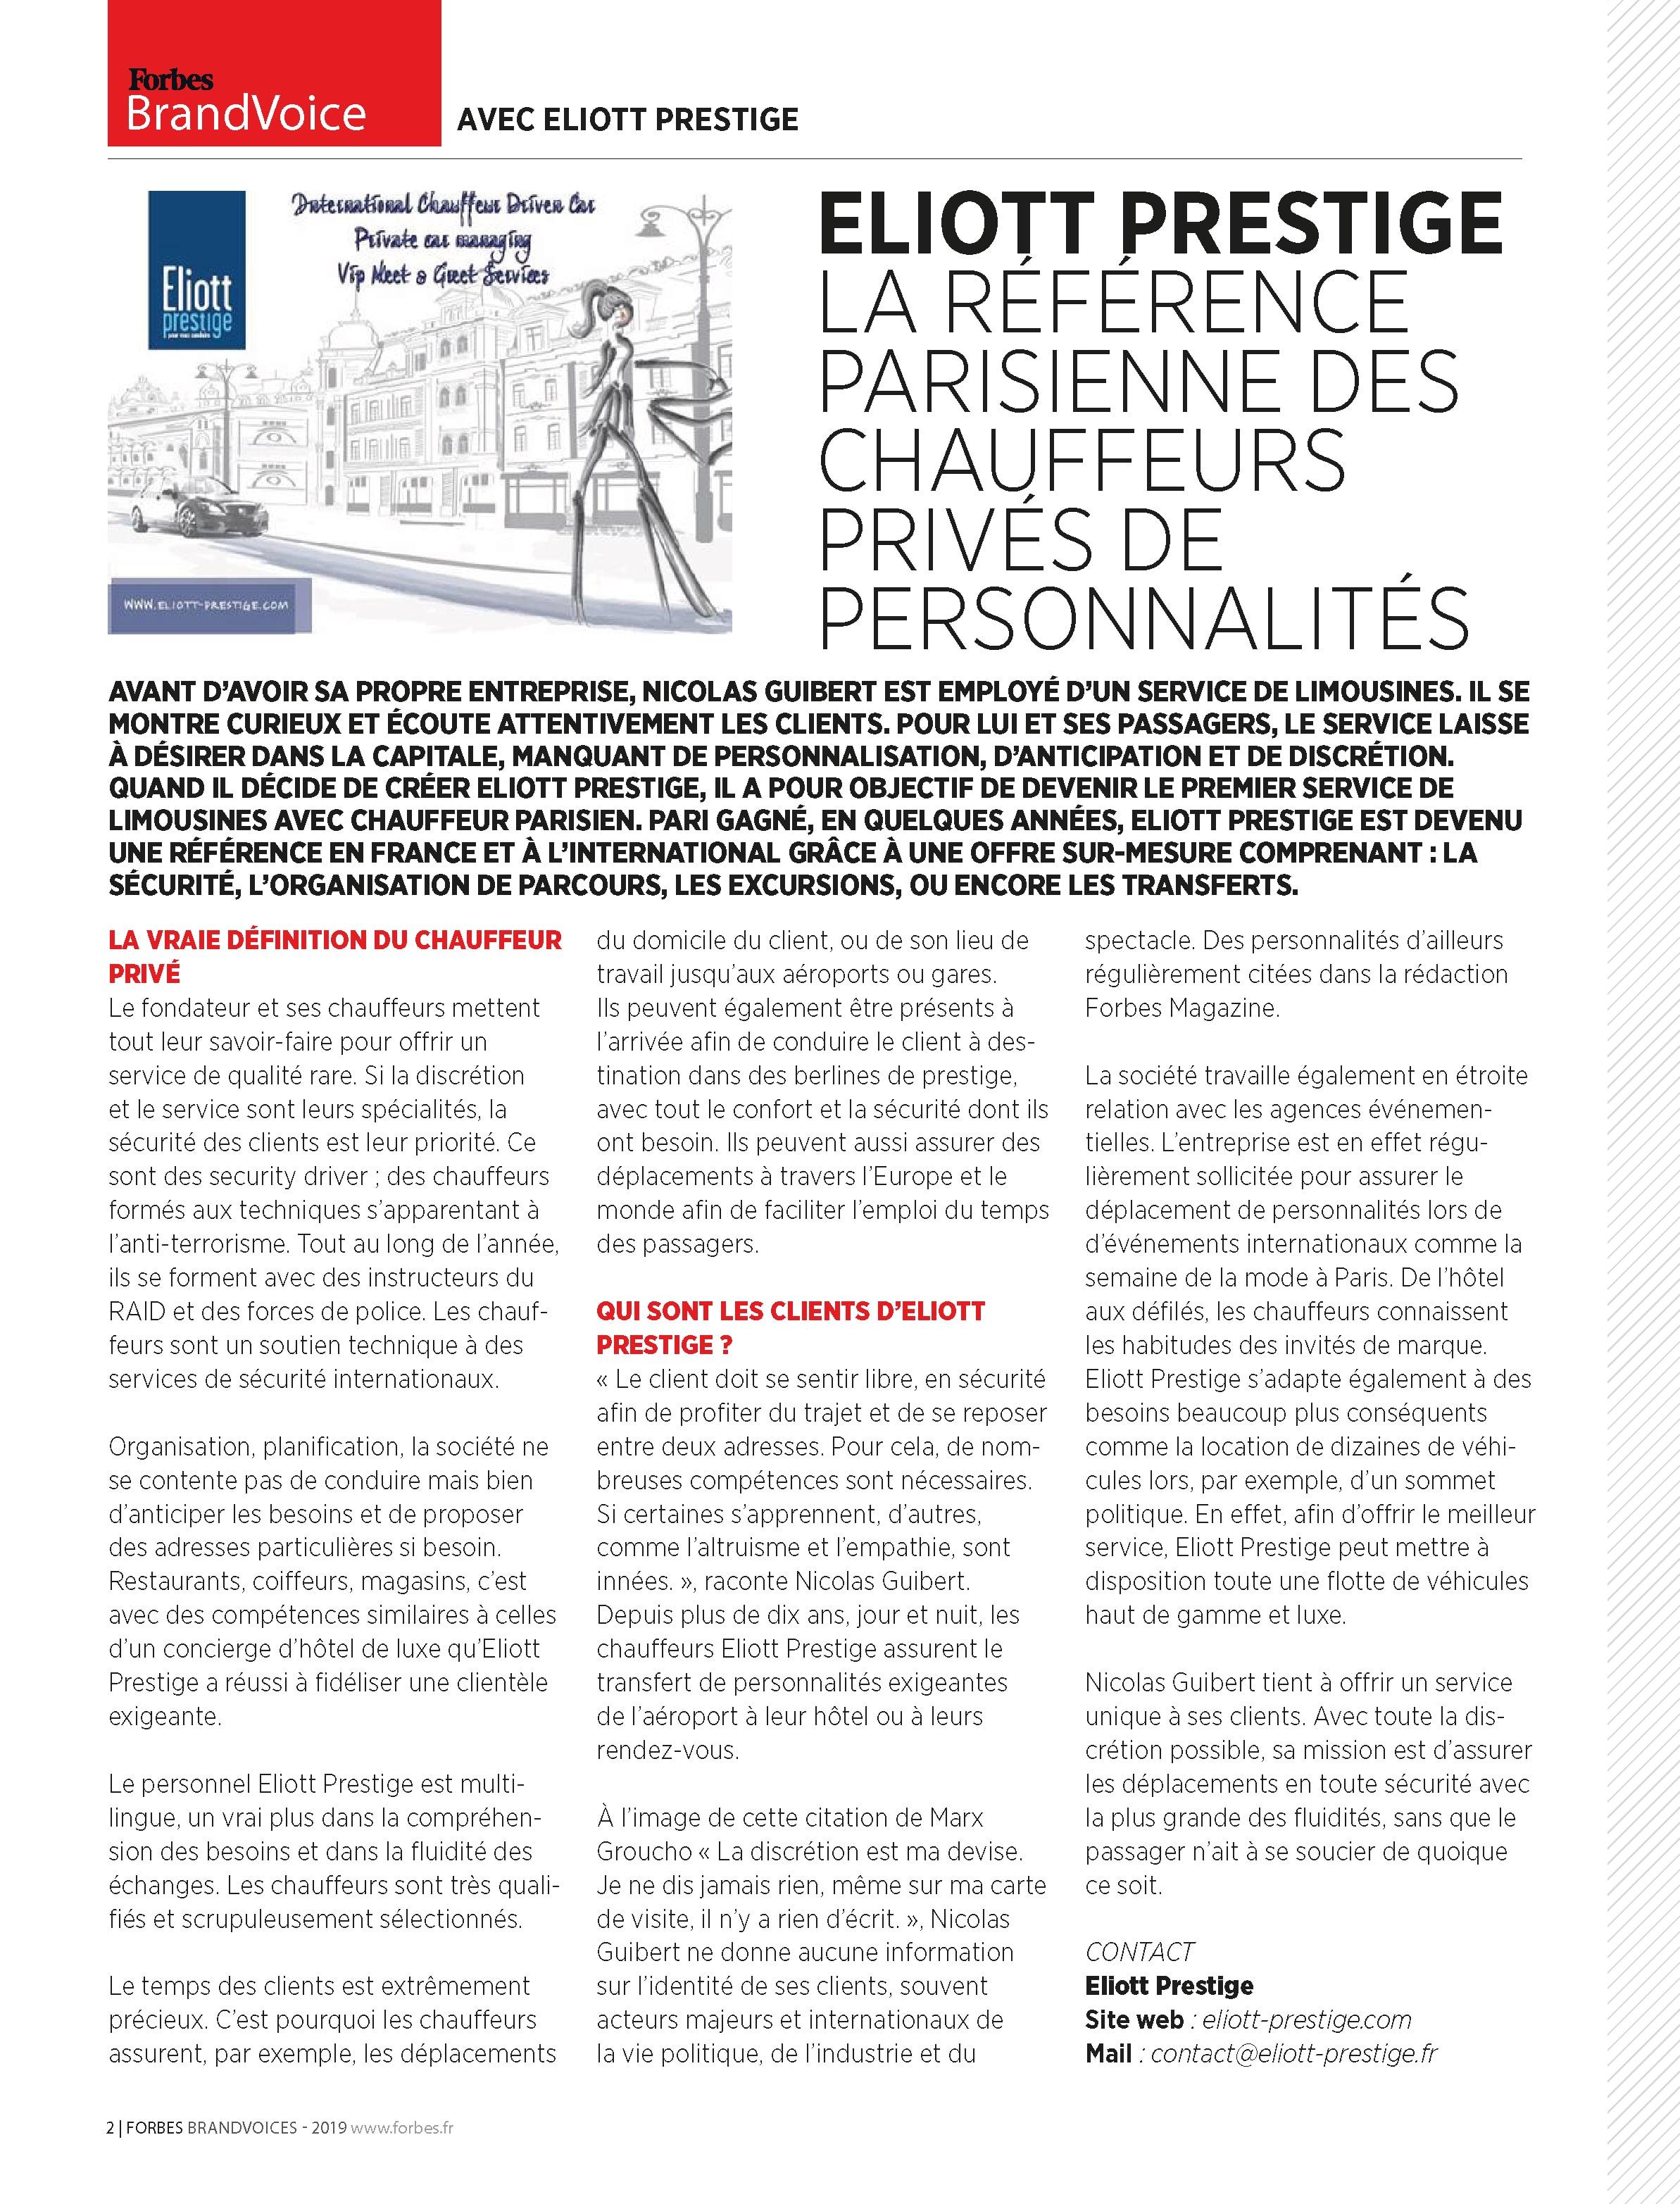 Eliott-Prestige-Parutions-Presse-FORBES-p1-min